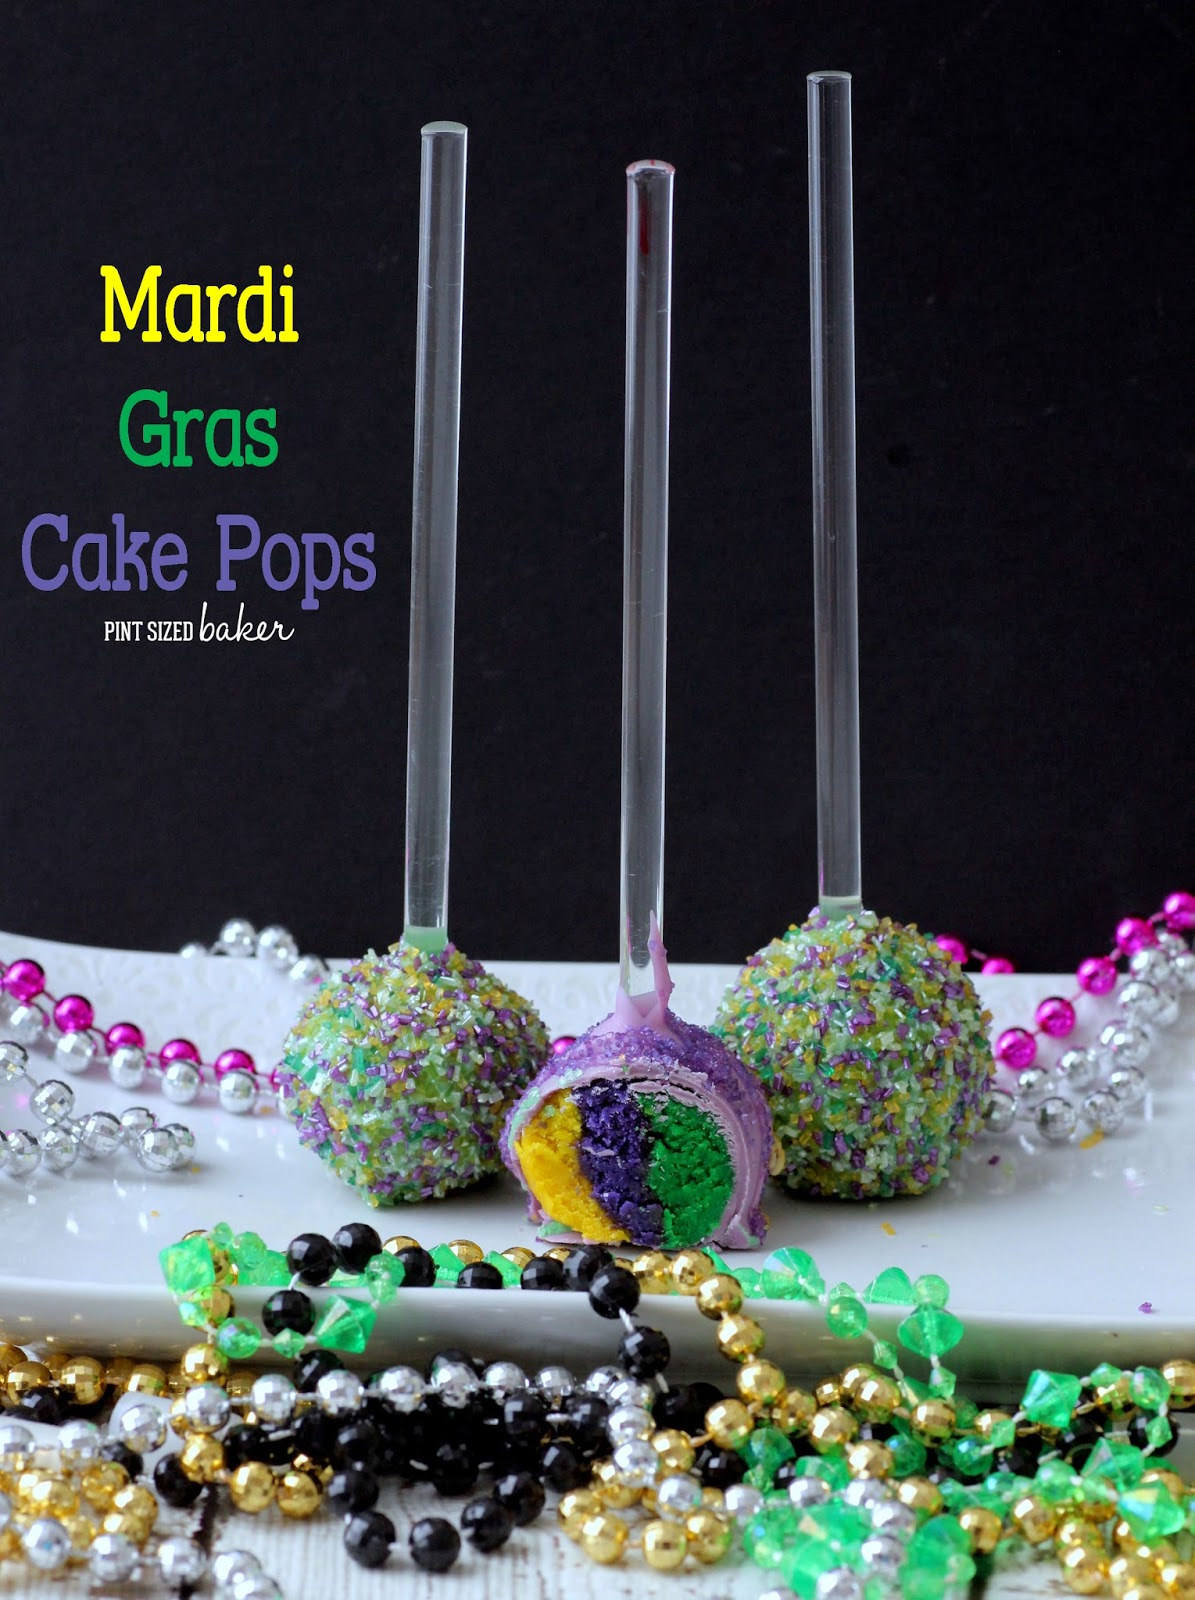 Mardi Gras Cake Pops. Tutorial on making multicolored cake pops.